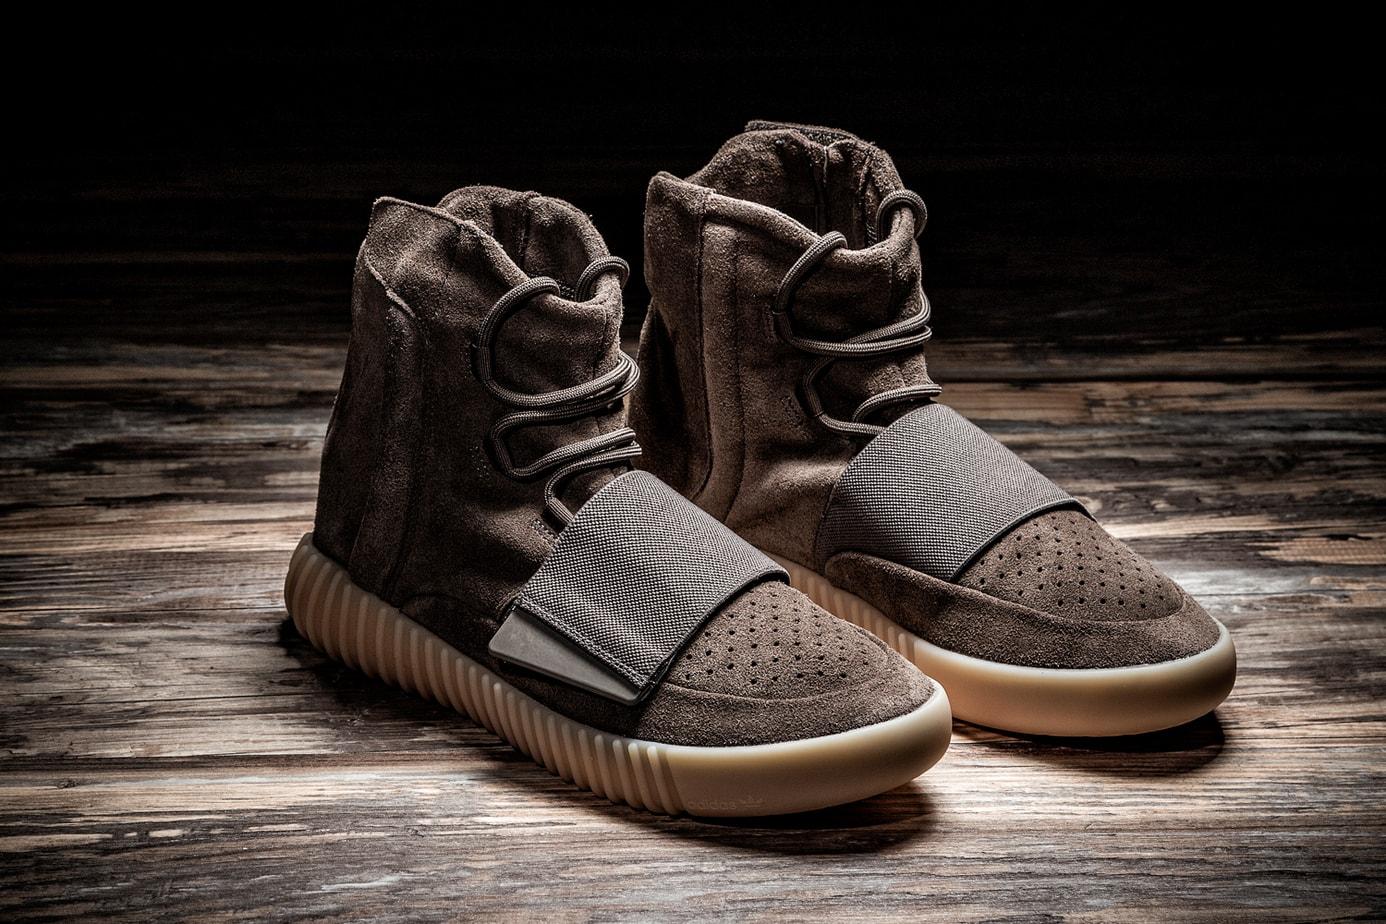 adidas yeezy 750 boost chocolate brown